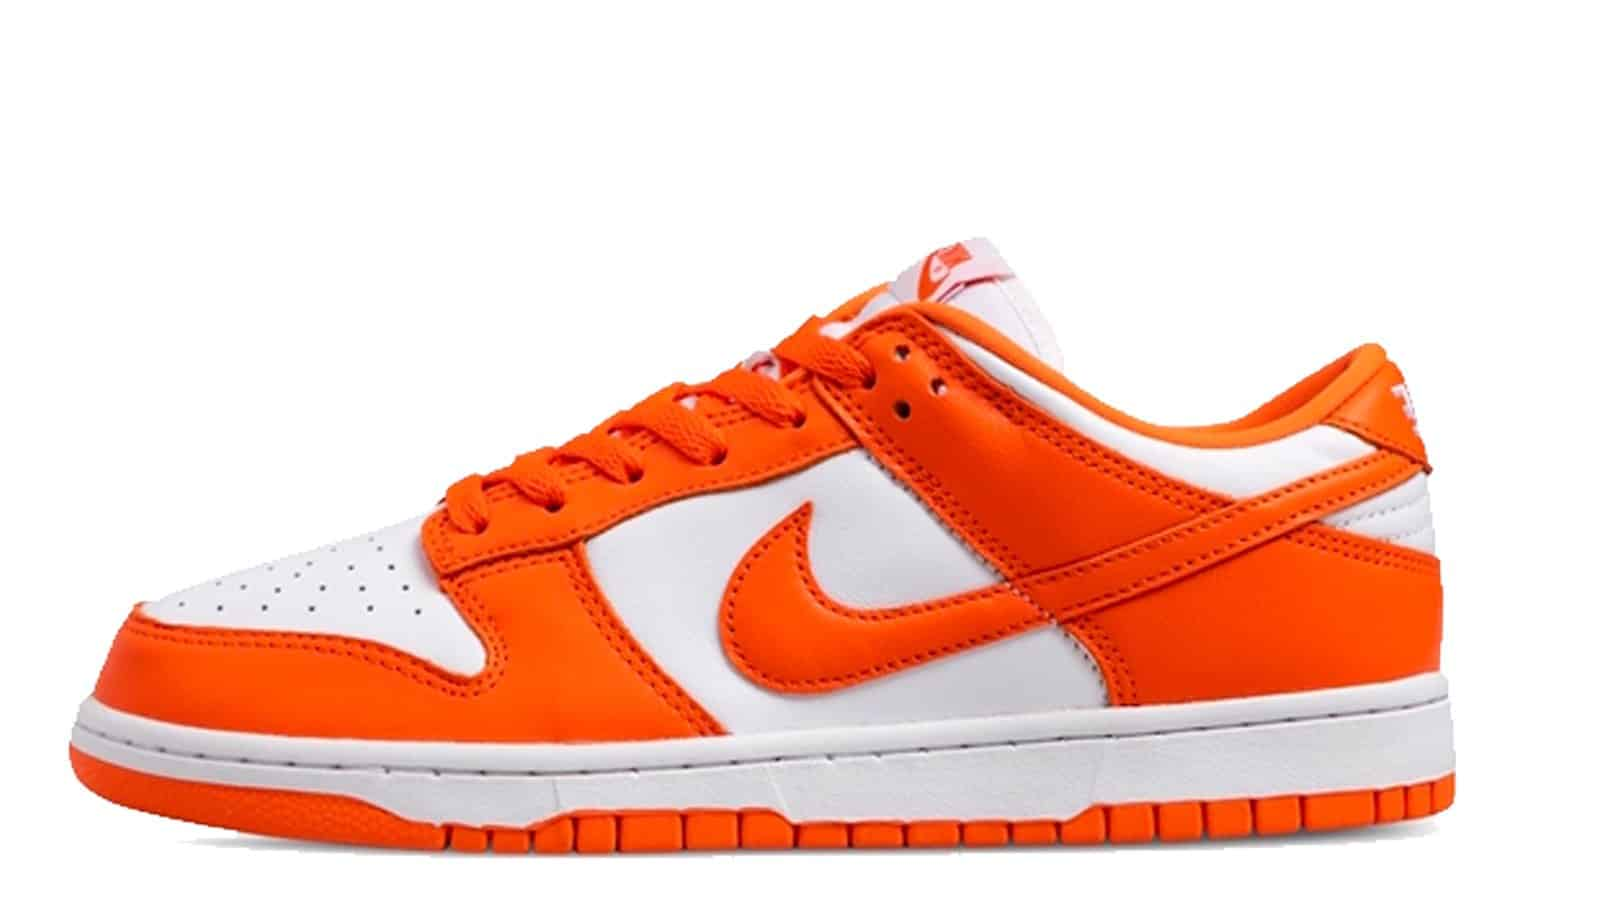 Nike Dunk Low SP 'Syracus'